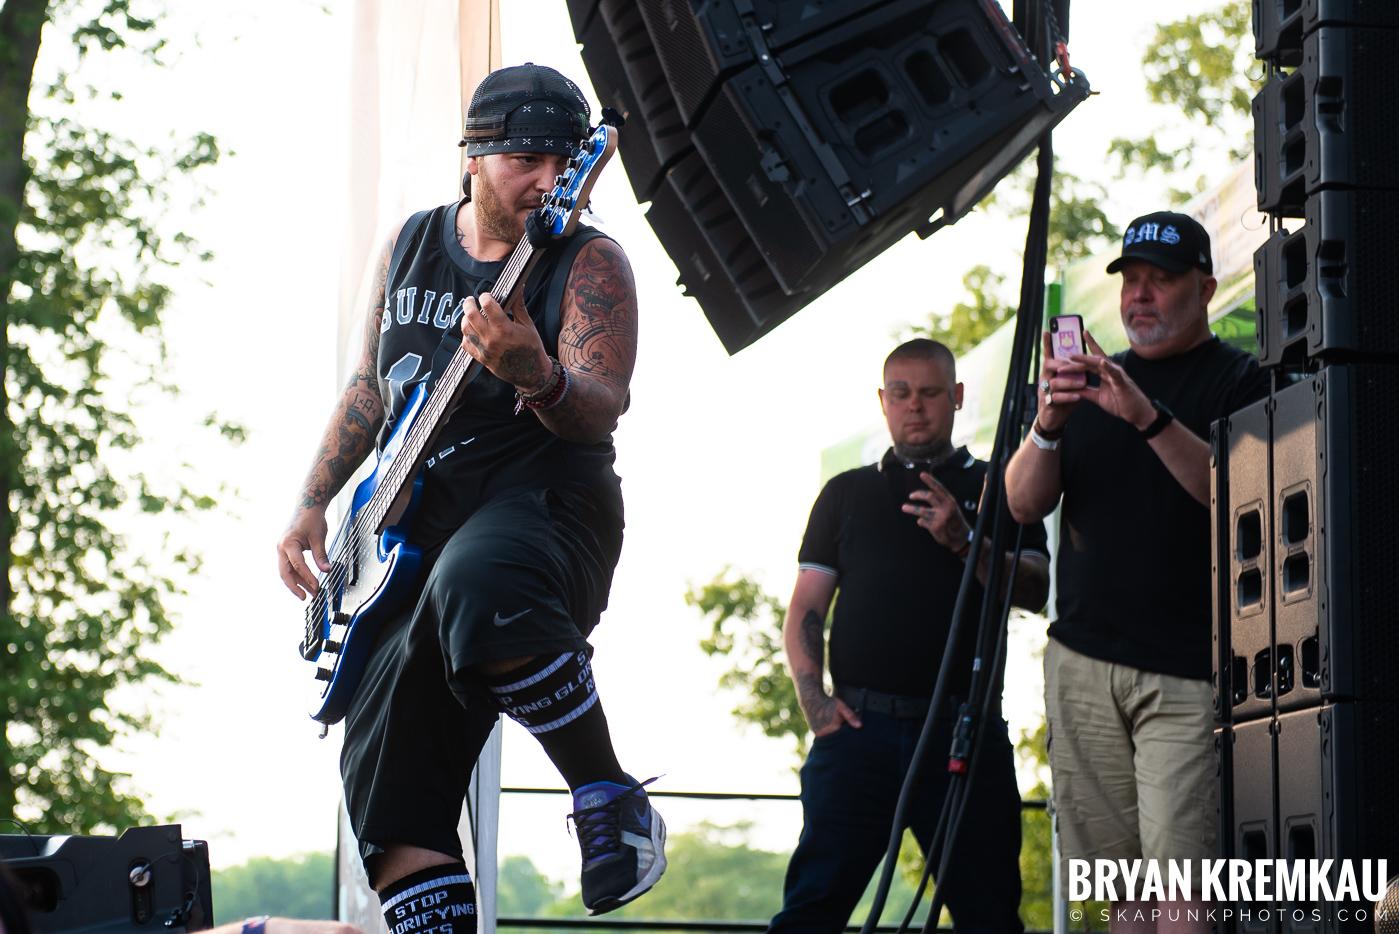 Suicidal Tendencies @ The Bash Music & Craft Beer Festival, Old Bridge Township Raceway Park, Englishtown, NJ - 6.2.19 (31)